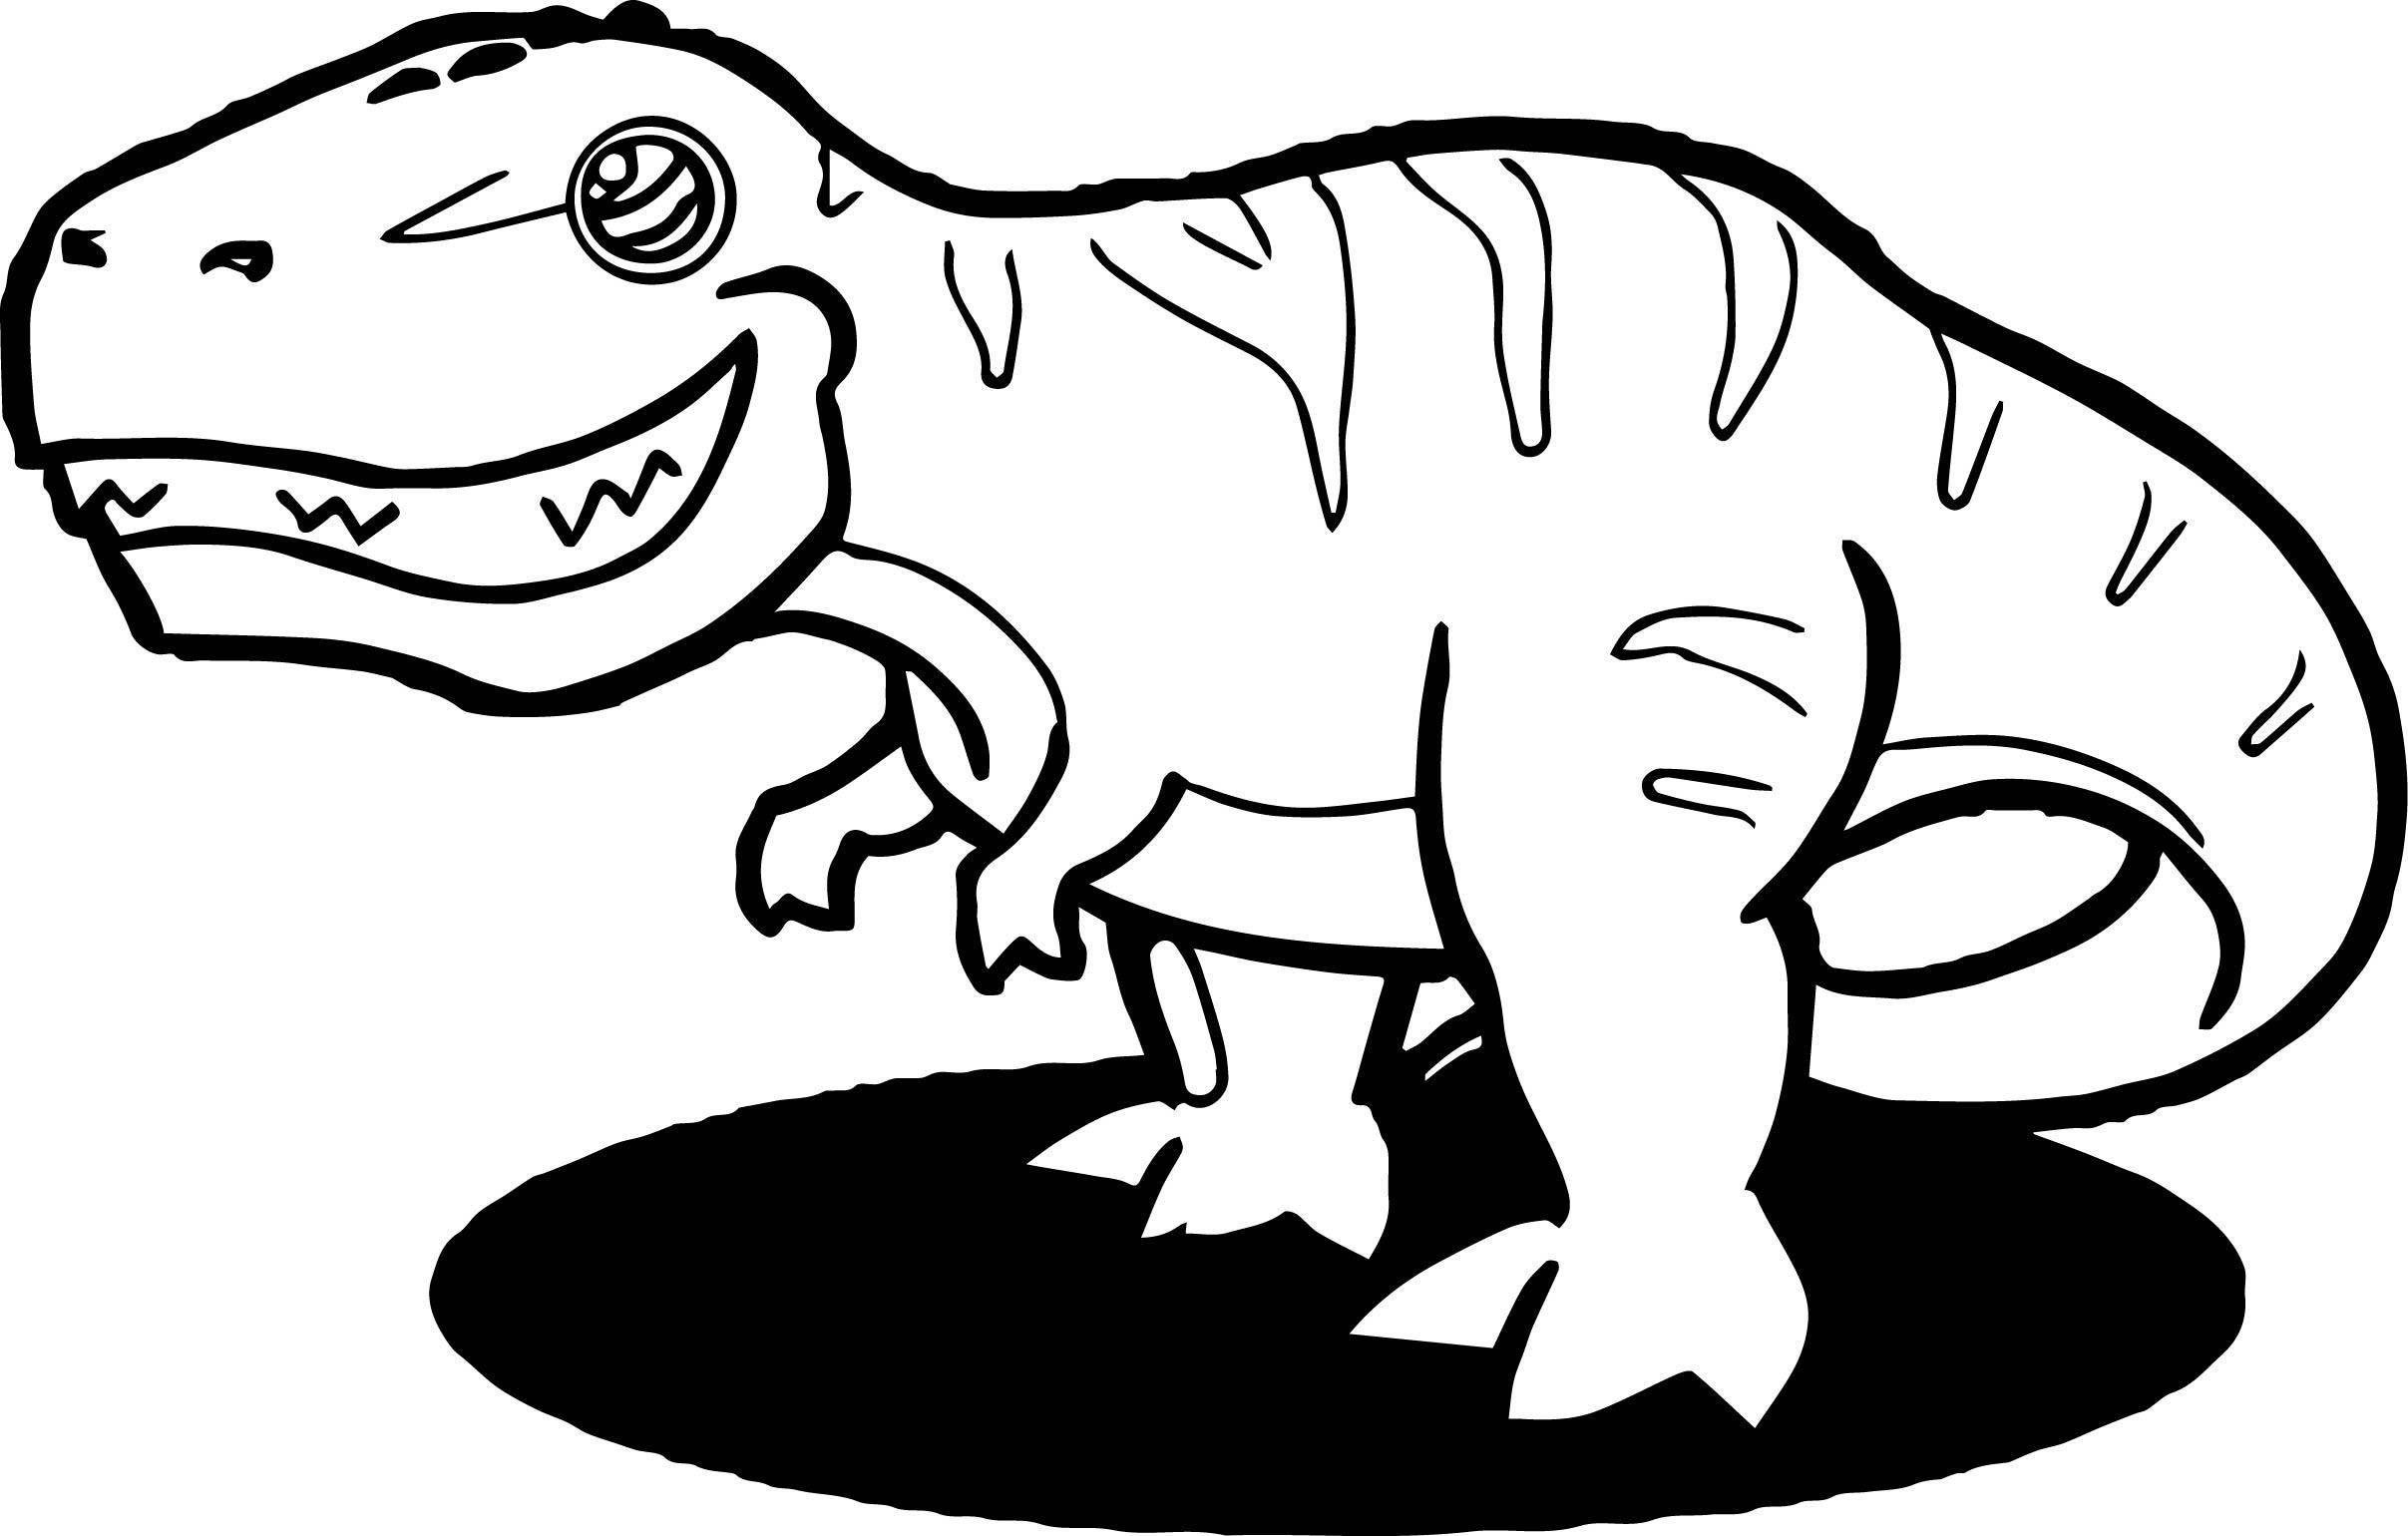 Dinosaur Wecoloringpage Coloring Page 091